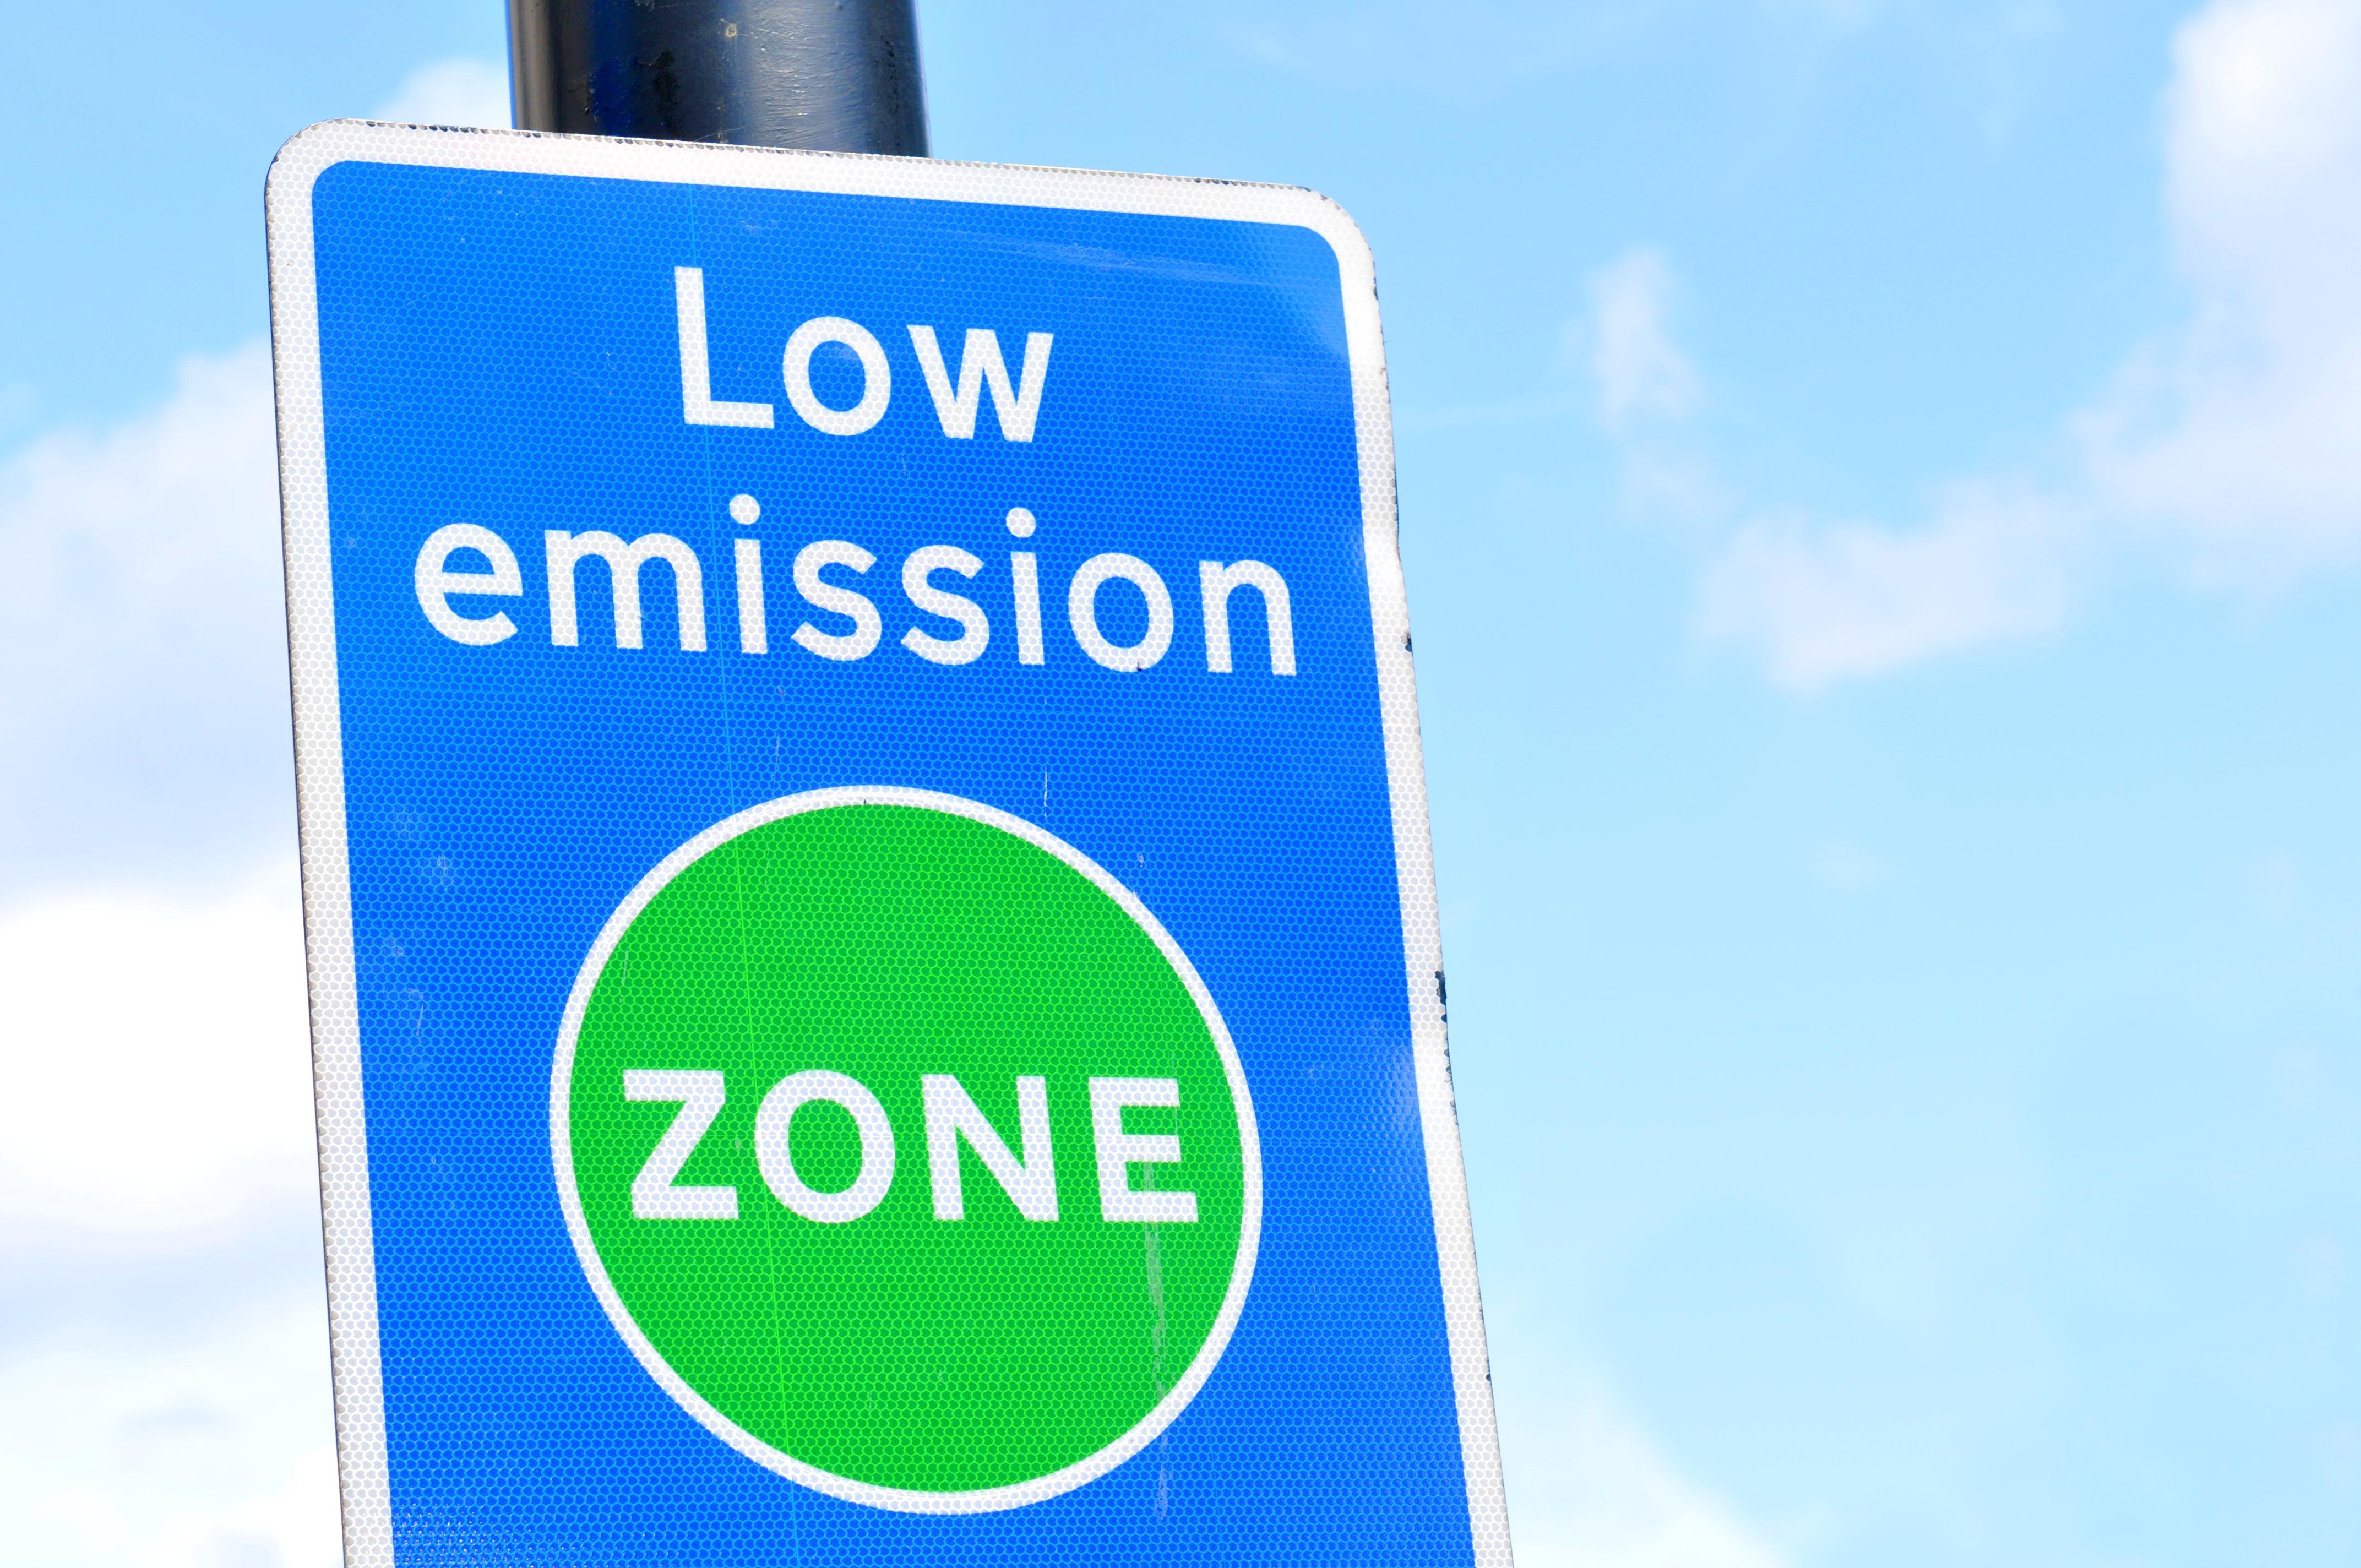 Europcar Receives Gold Rating for Social, Environmental Responsibility